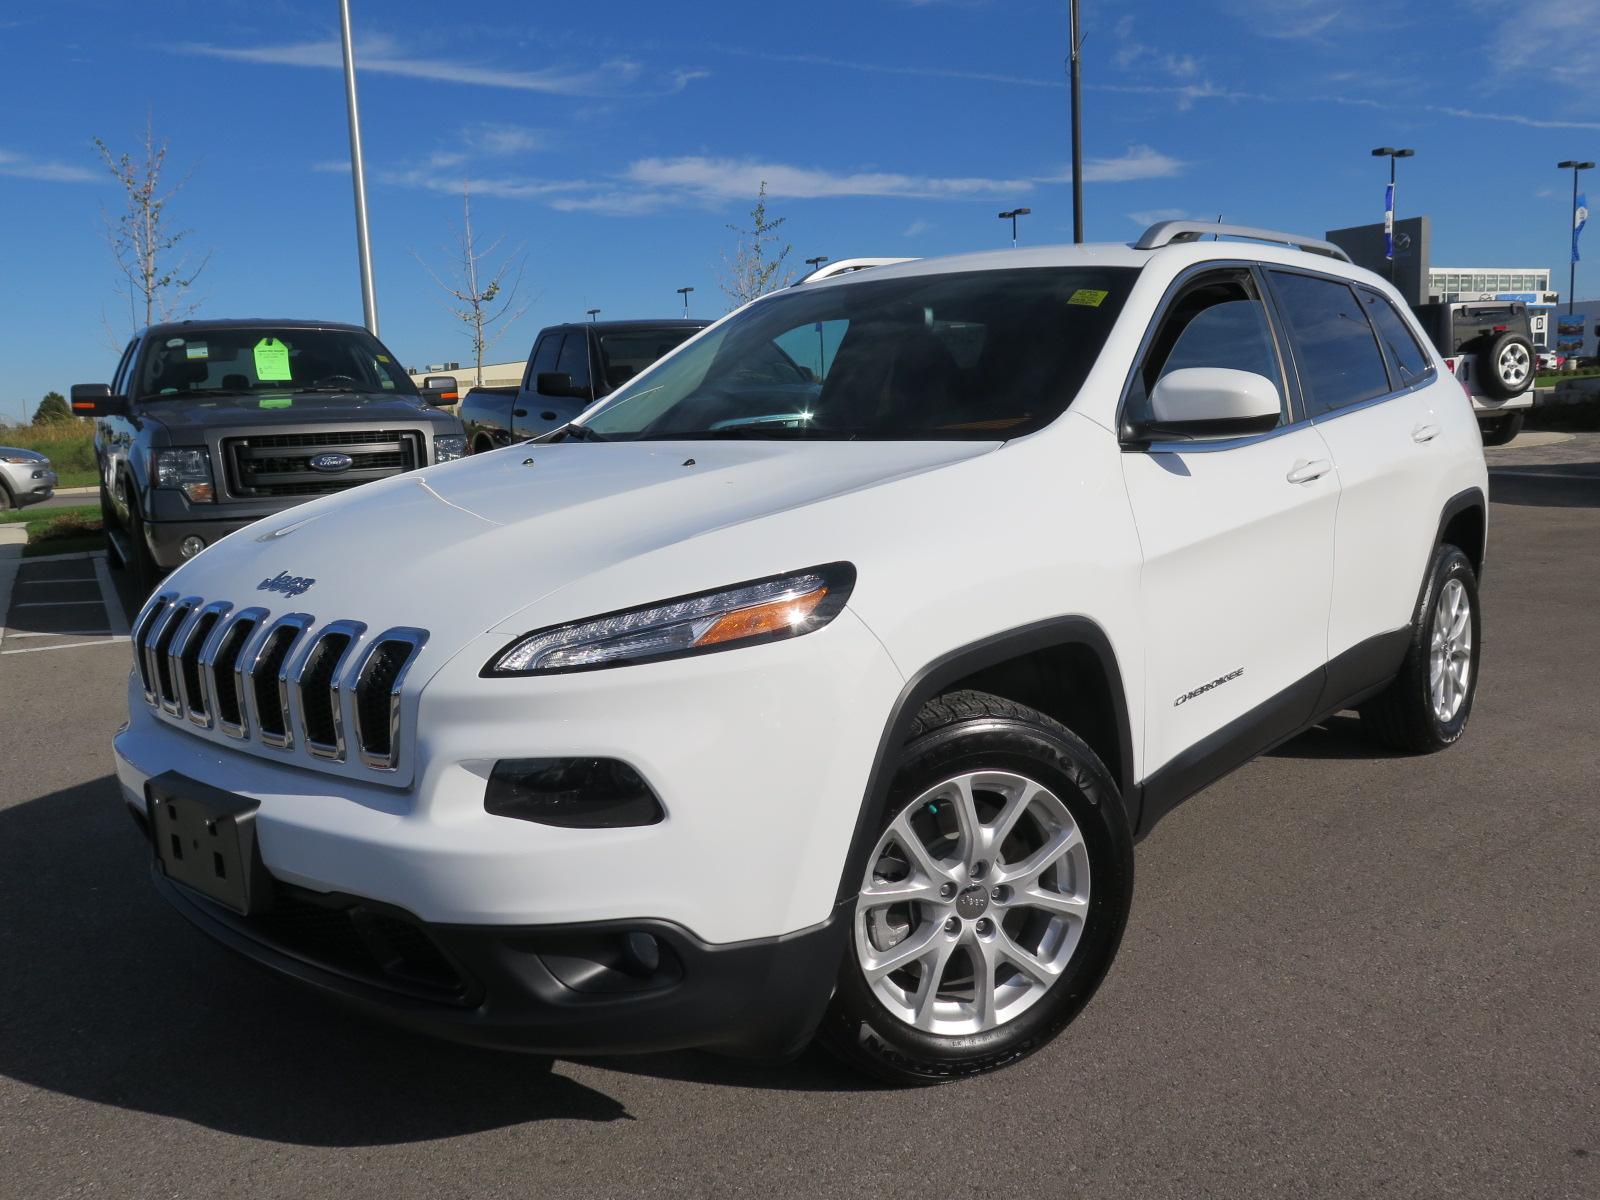 New 2015 Jeep Cherokee, $27233